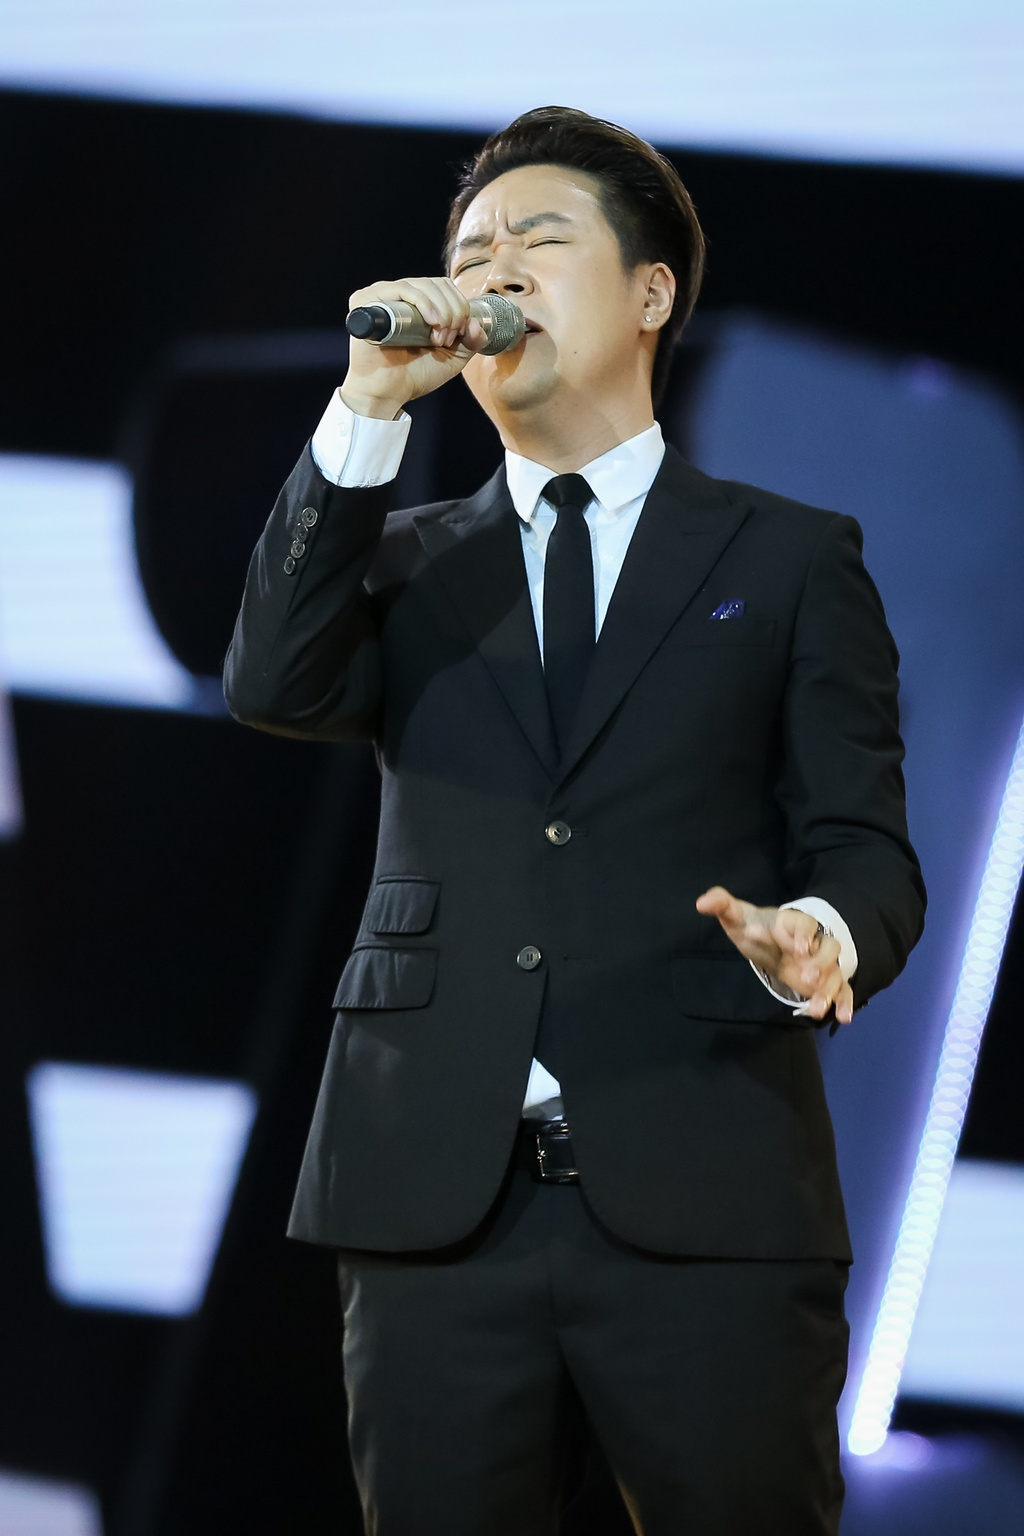 Hang loat hit Vpop duoc tai hien tren san khau le trao giai ZMA 2017 hinh anh 16